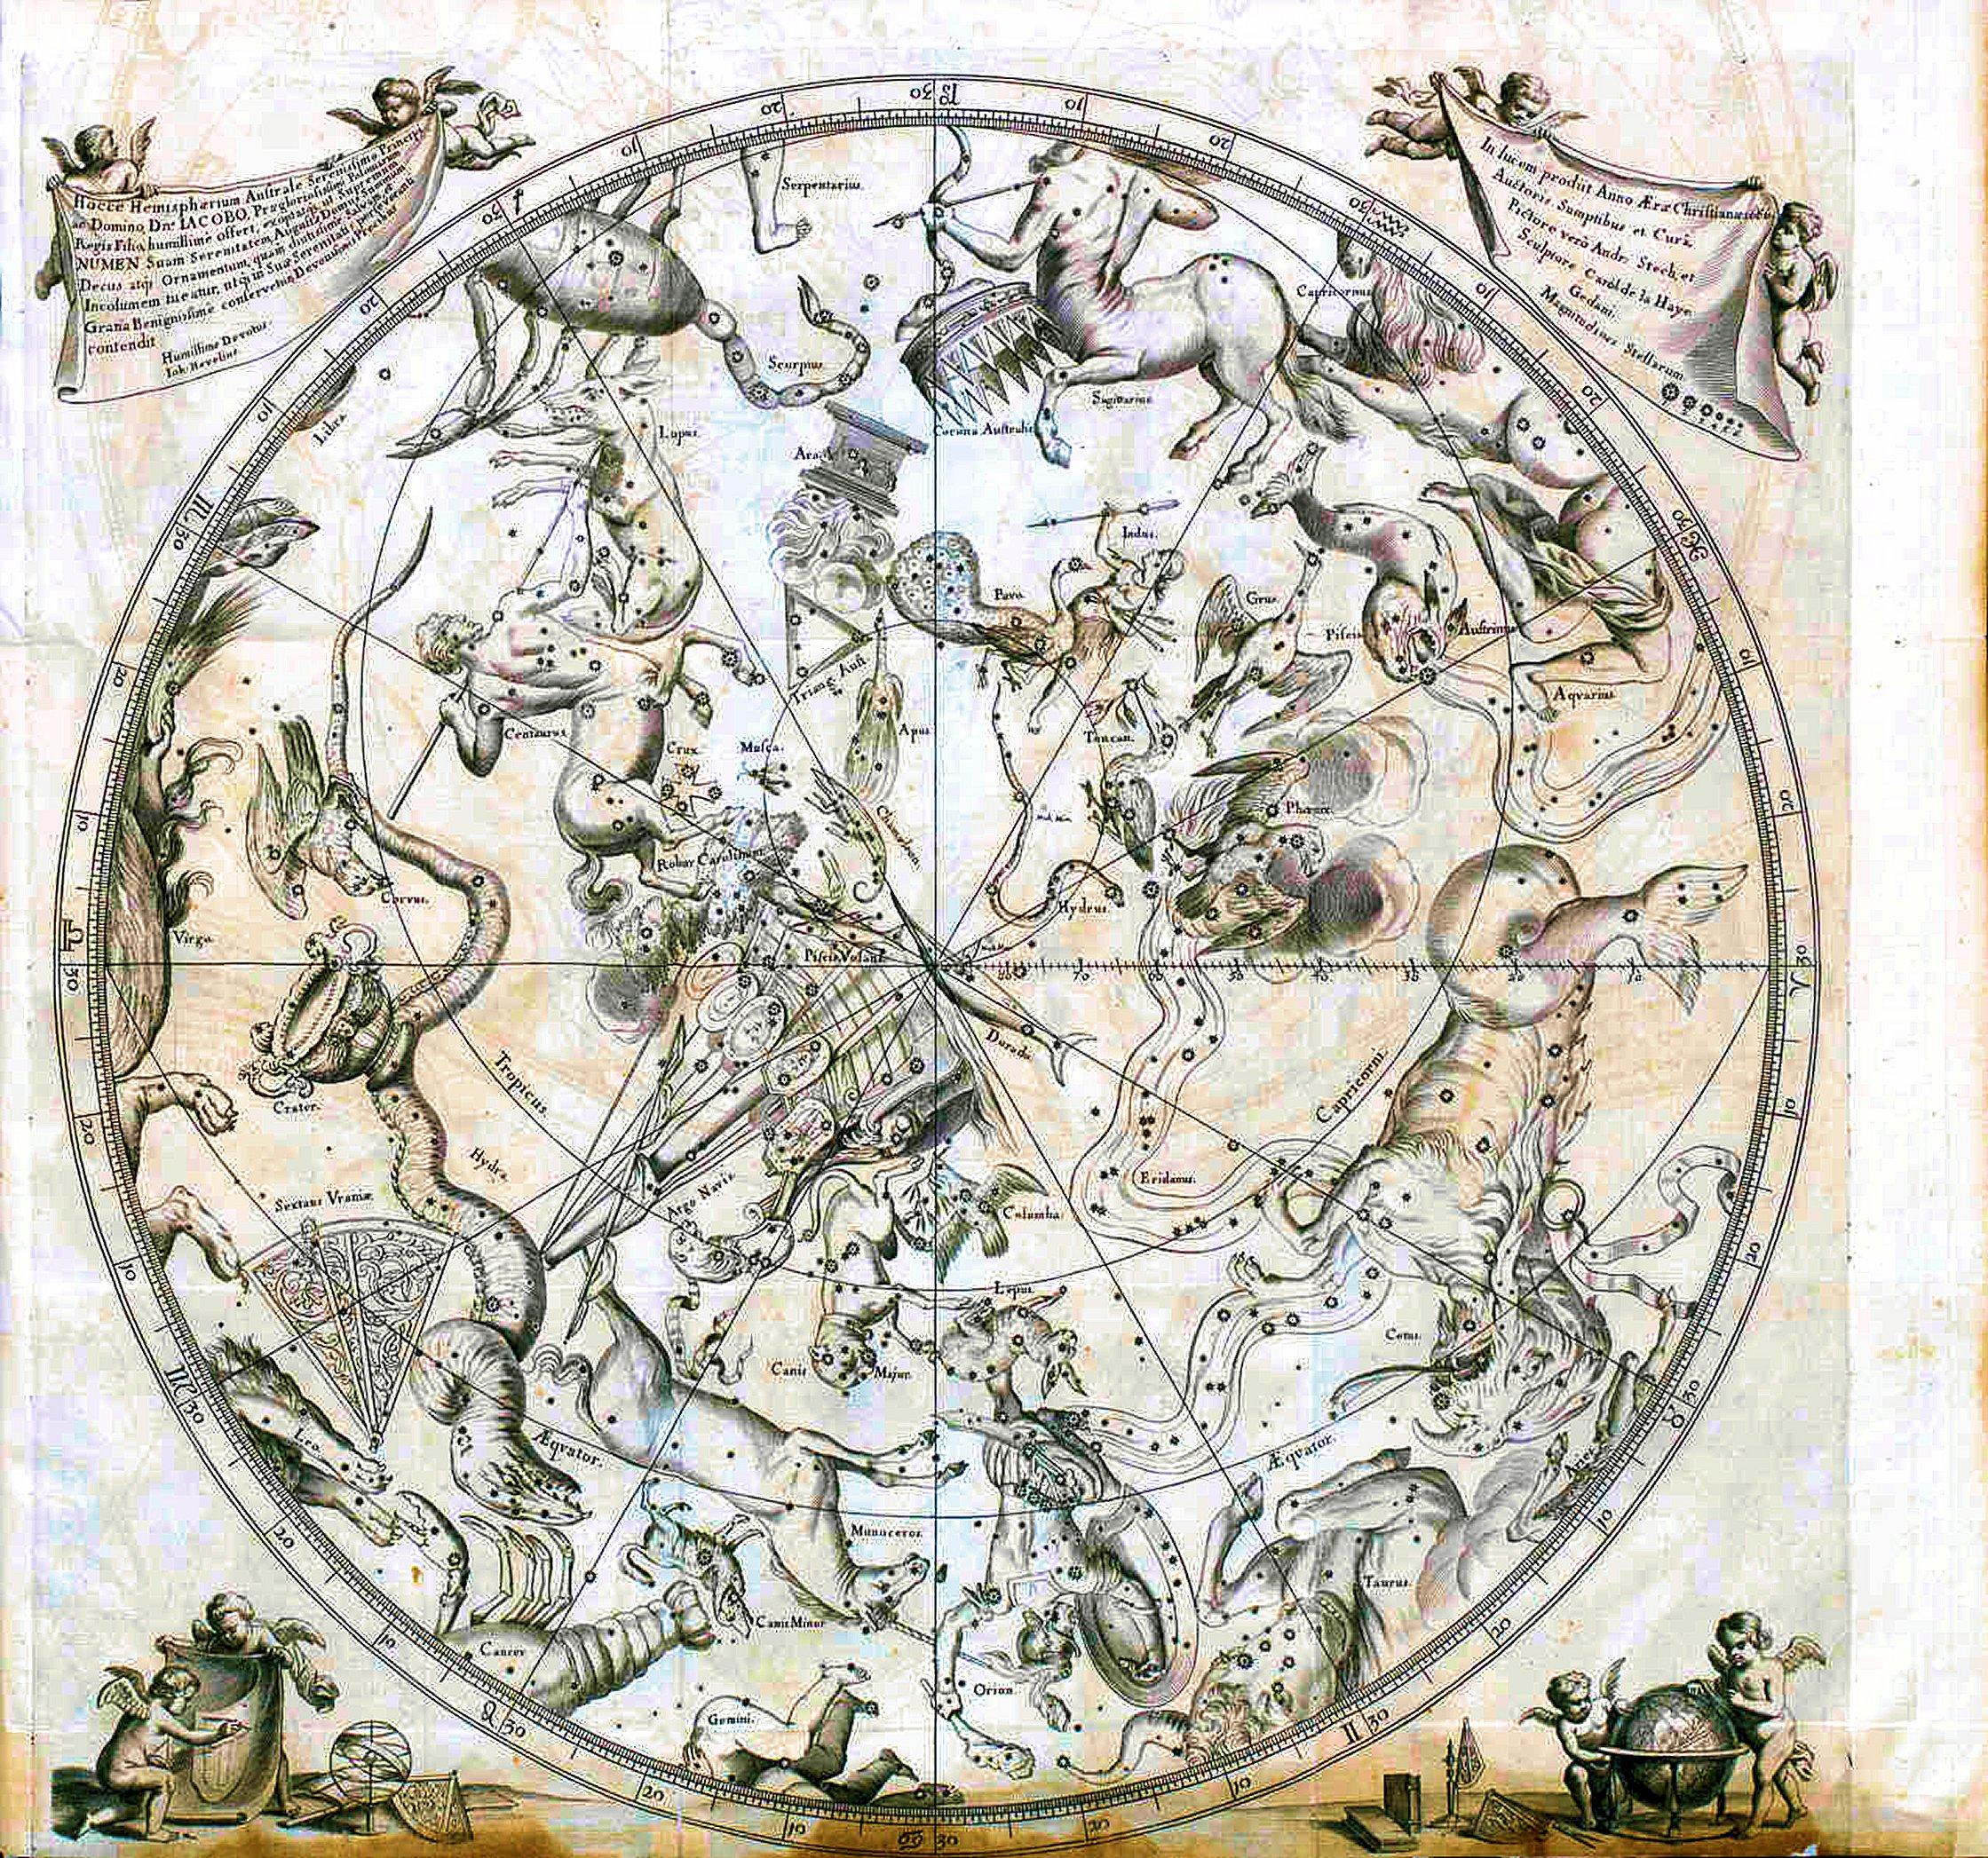 https://i2.wp.com/upload.wikimedia.org/wikipedia/commons/f/f1/Johannes_Hevelius_-_Prodromus_Astronomia_-_Volume_III_%22Firmamentum_Sobiescianum,_sive_uranographia%22_-_Tavola_Emisfero_Australe.jpg